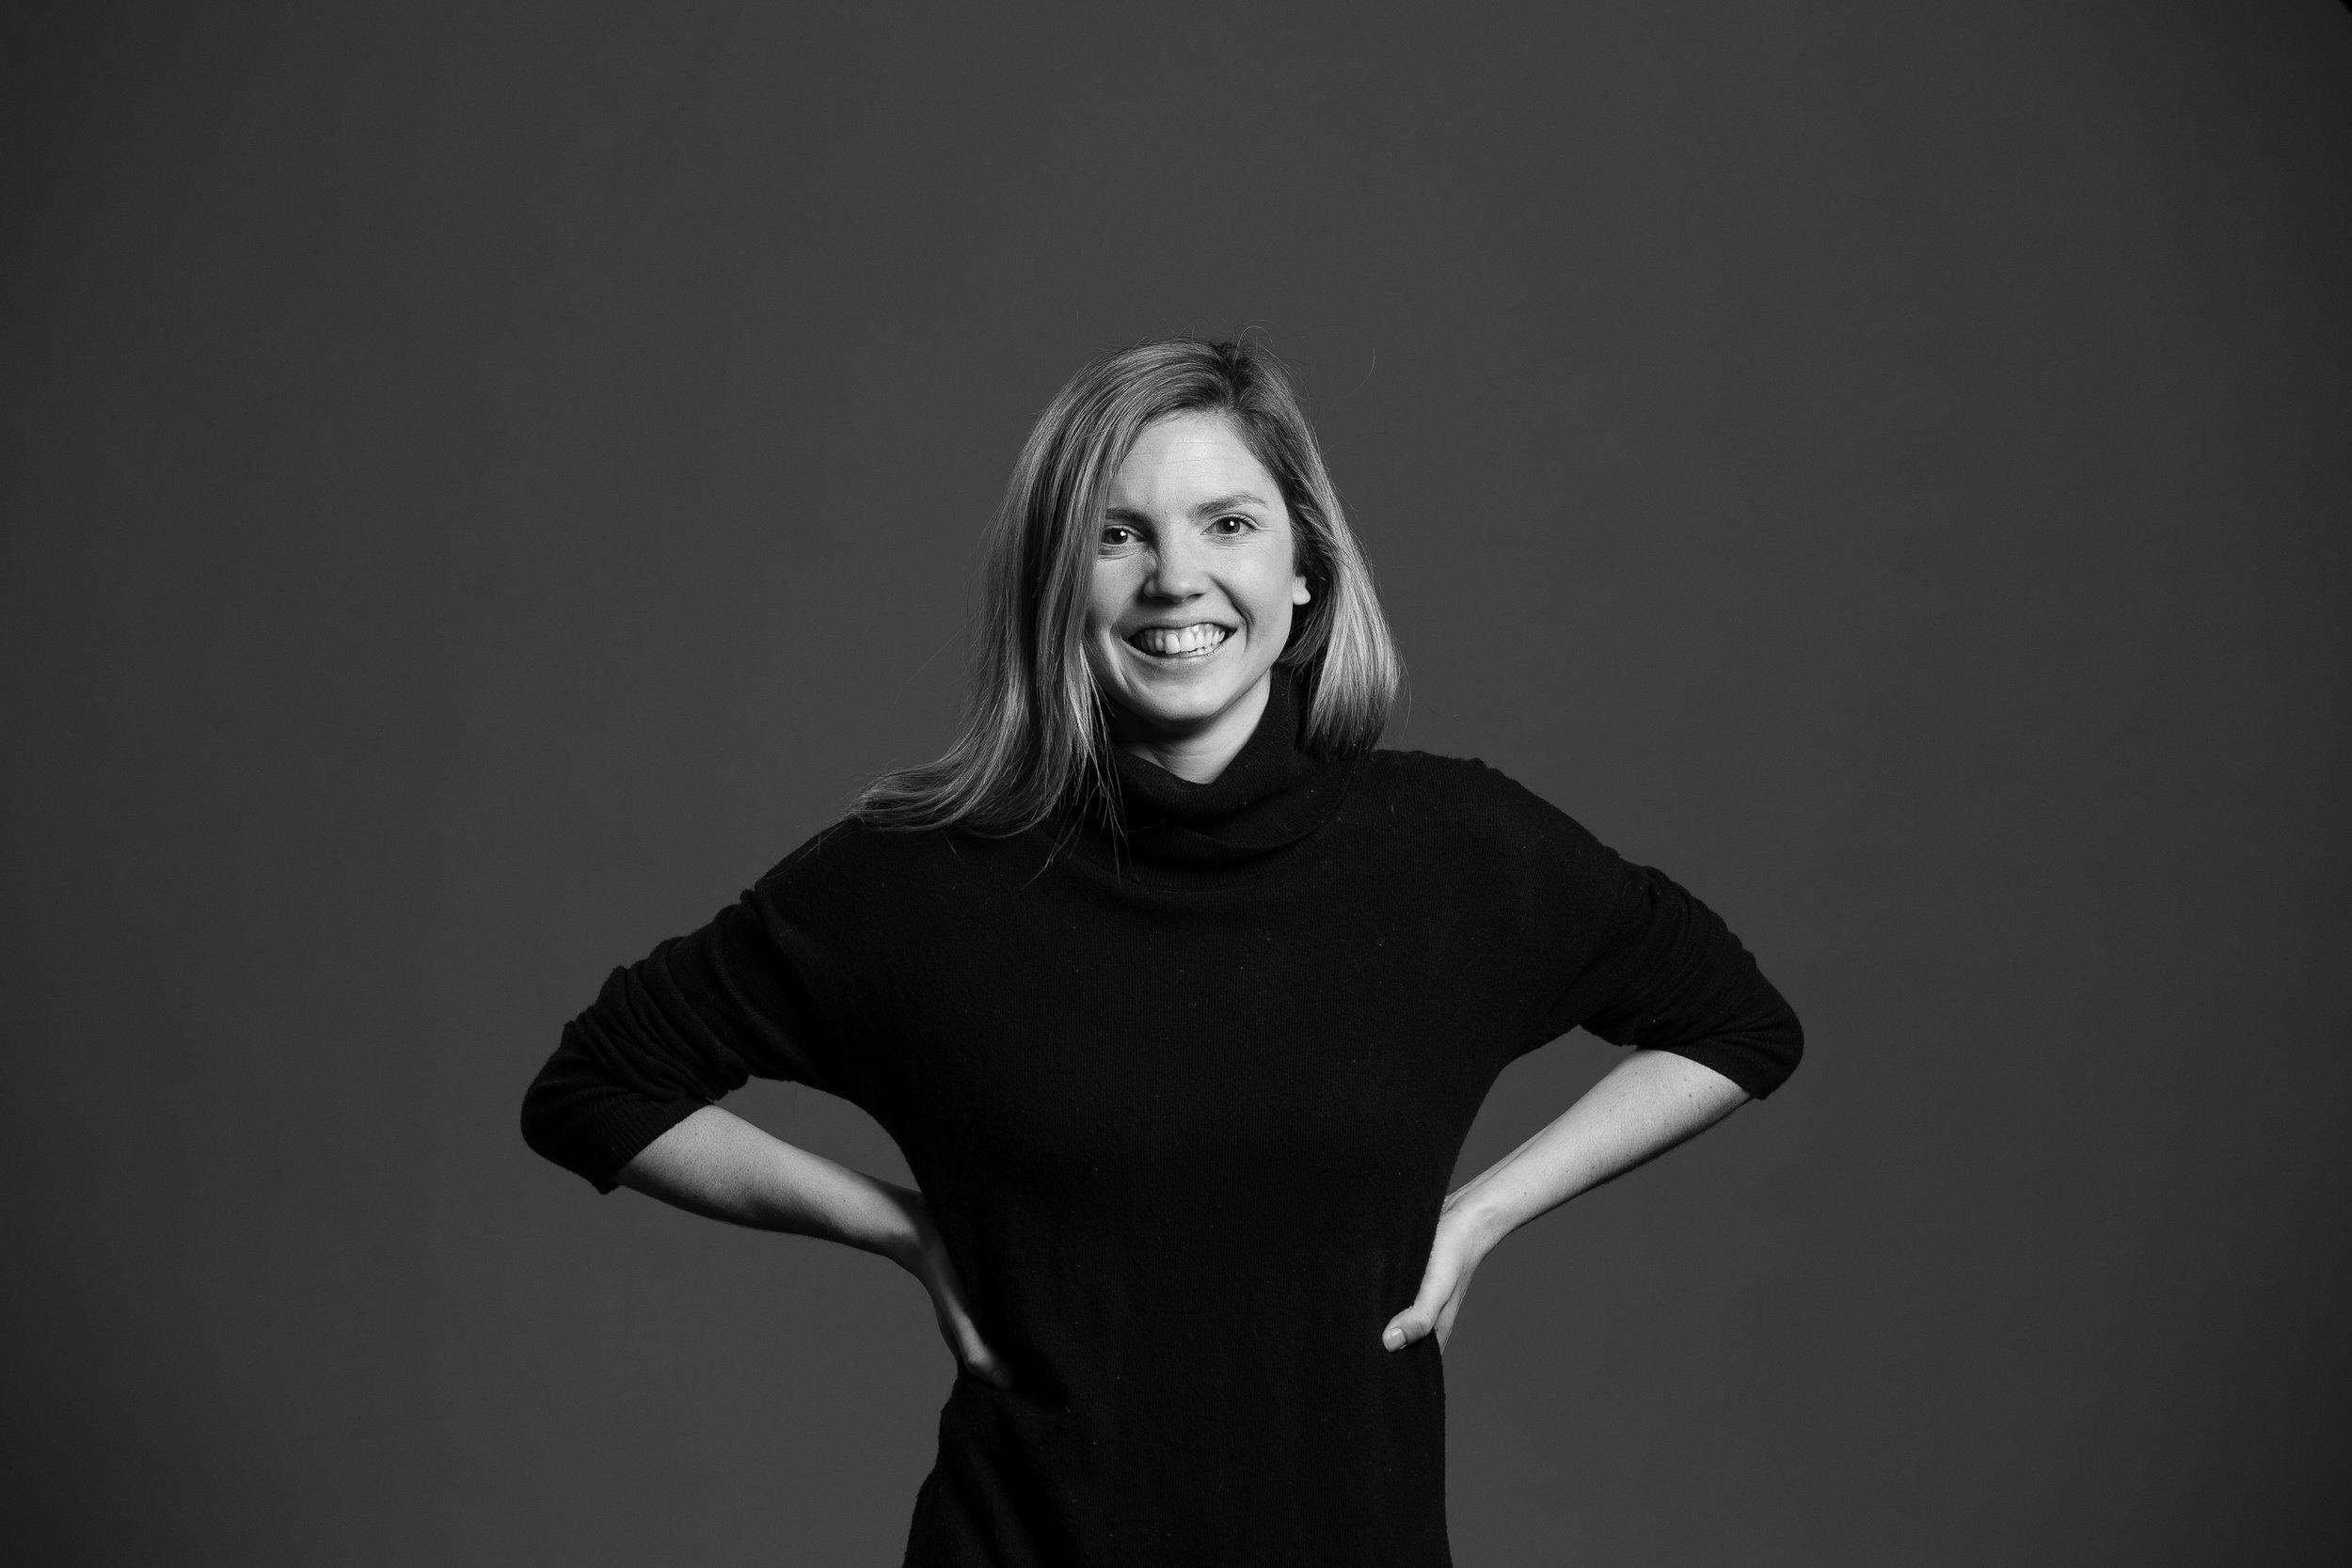 Haley Hickman, MS, RD